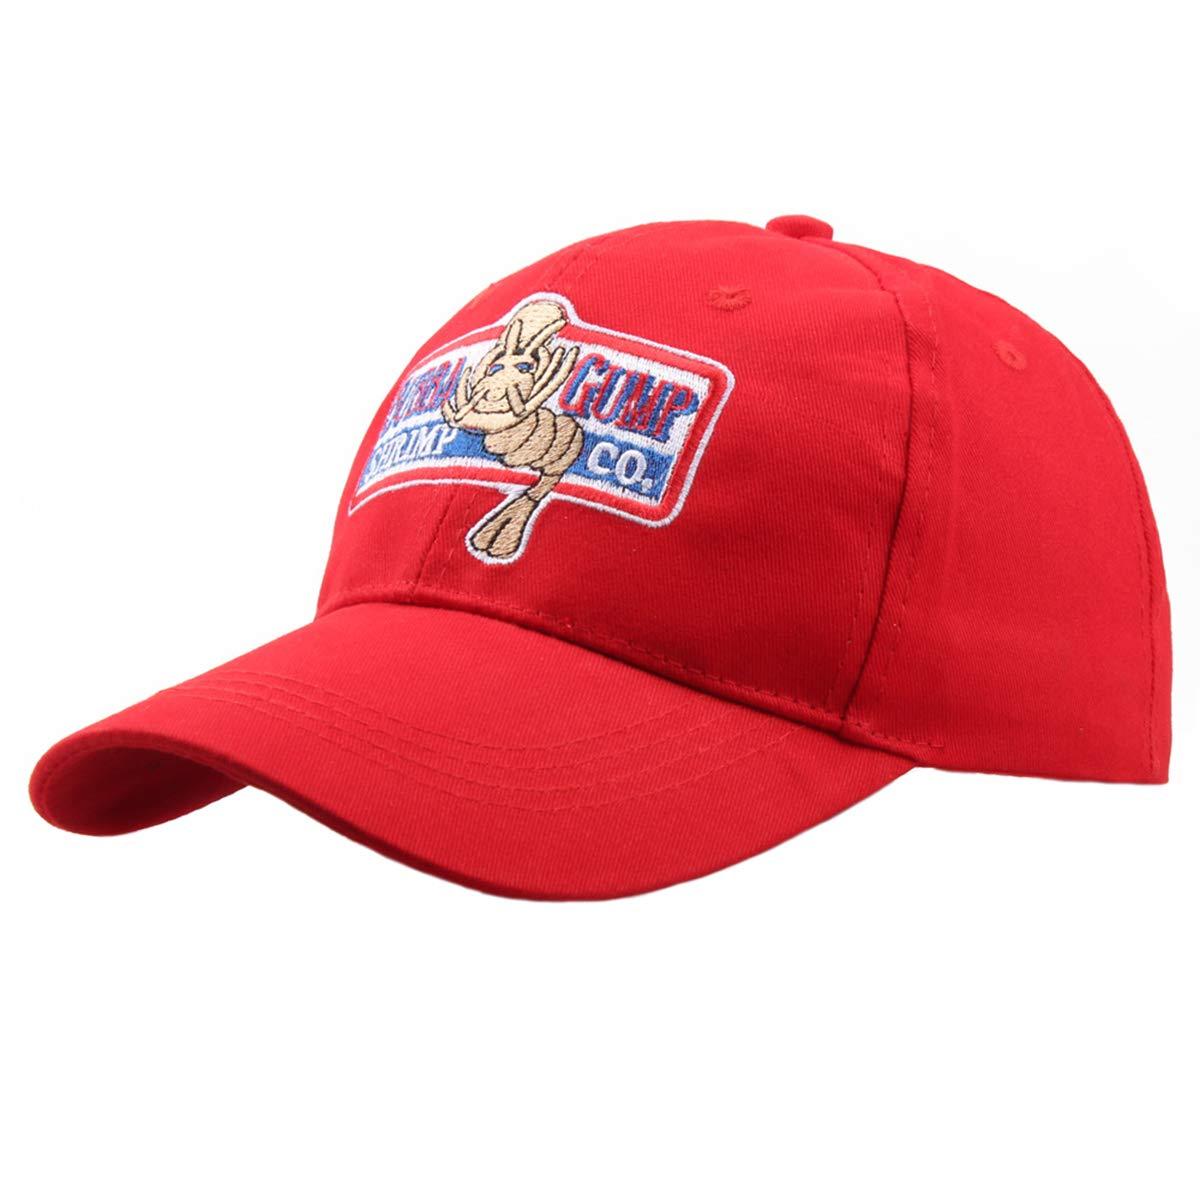 Himozoo Adjustable Bubba Gump Baseball Cap Shrimp Co. Embroidered Snapback Hats